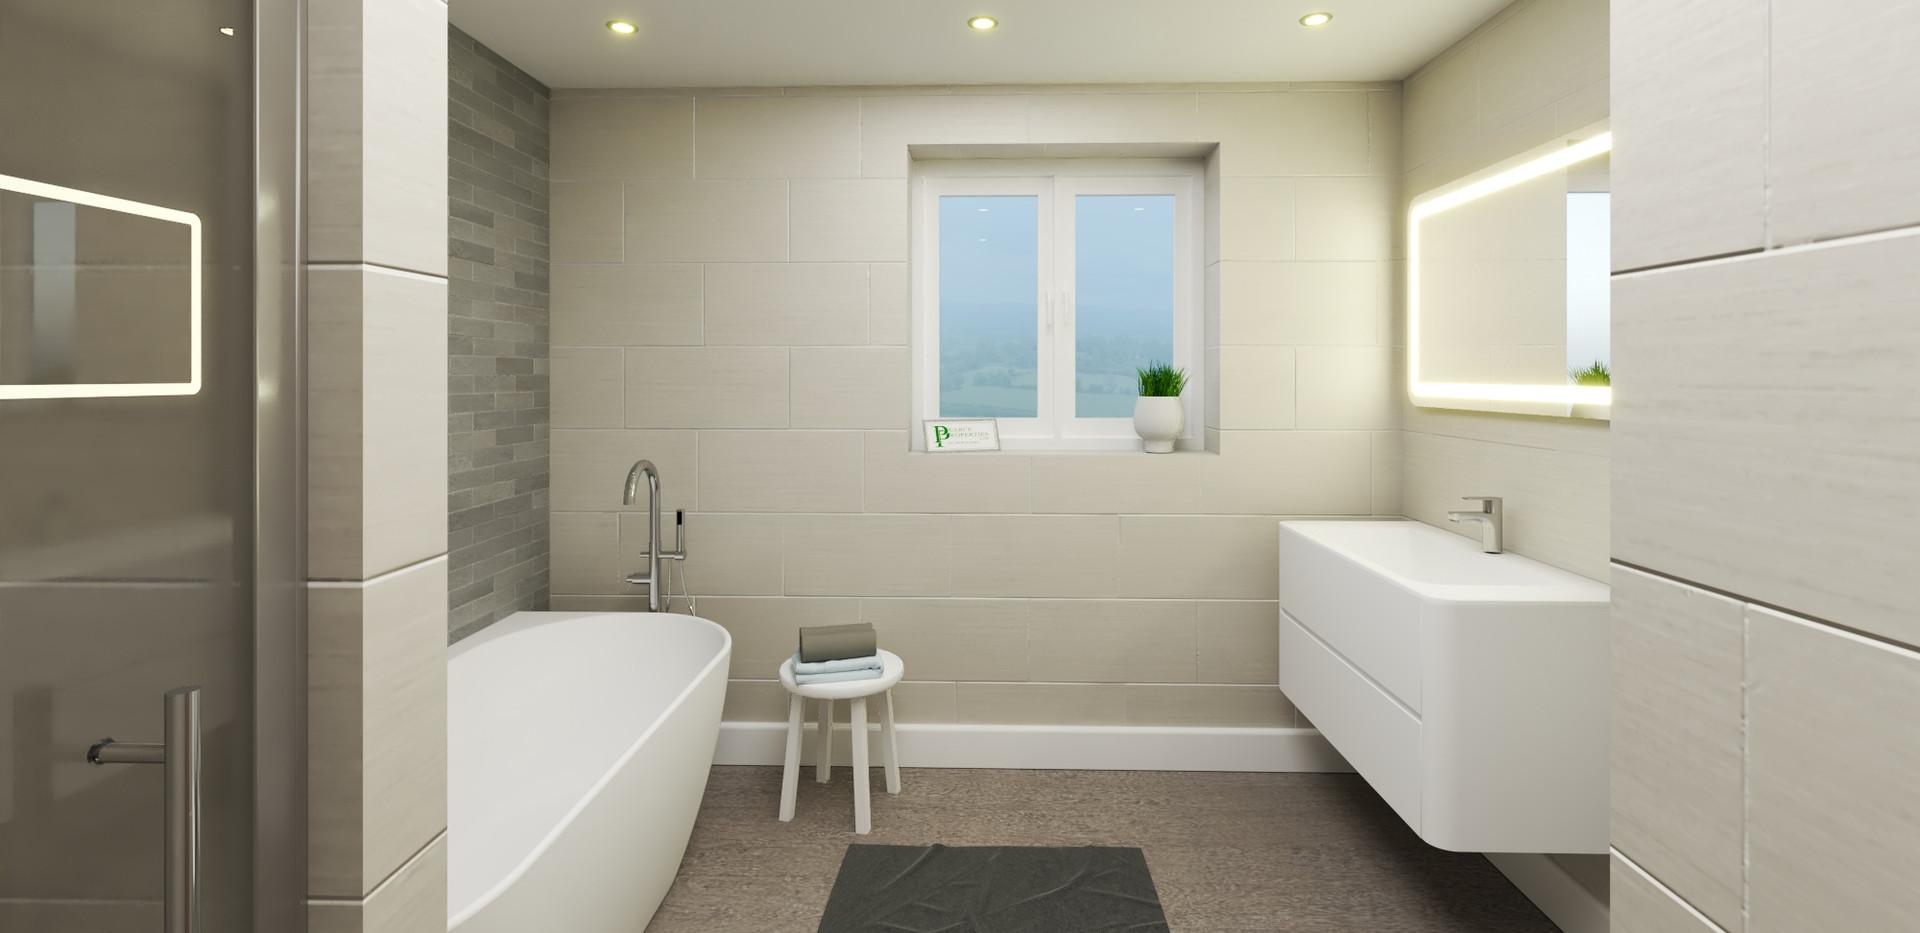 Plot 1 Bathroom